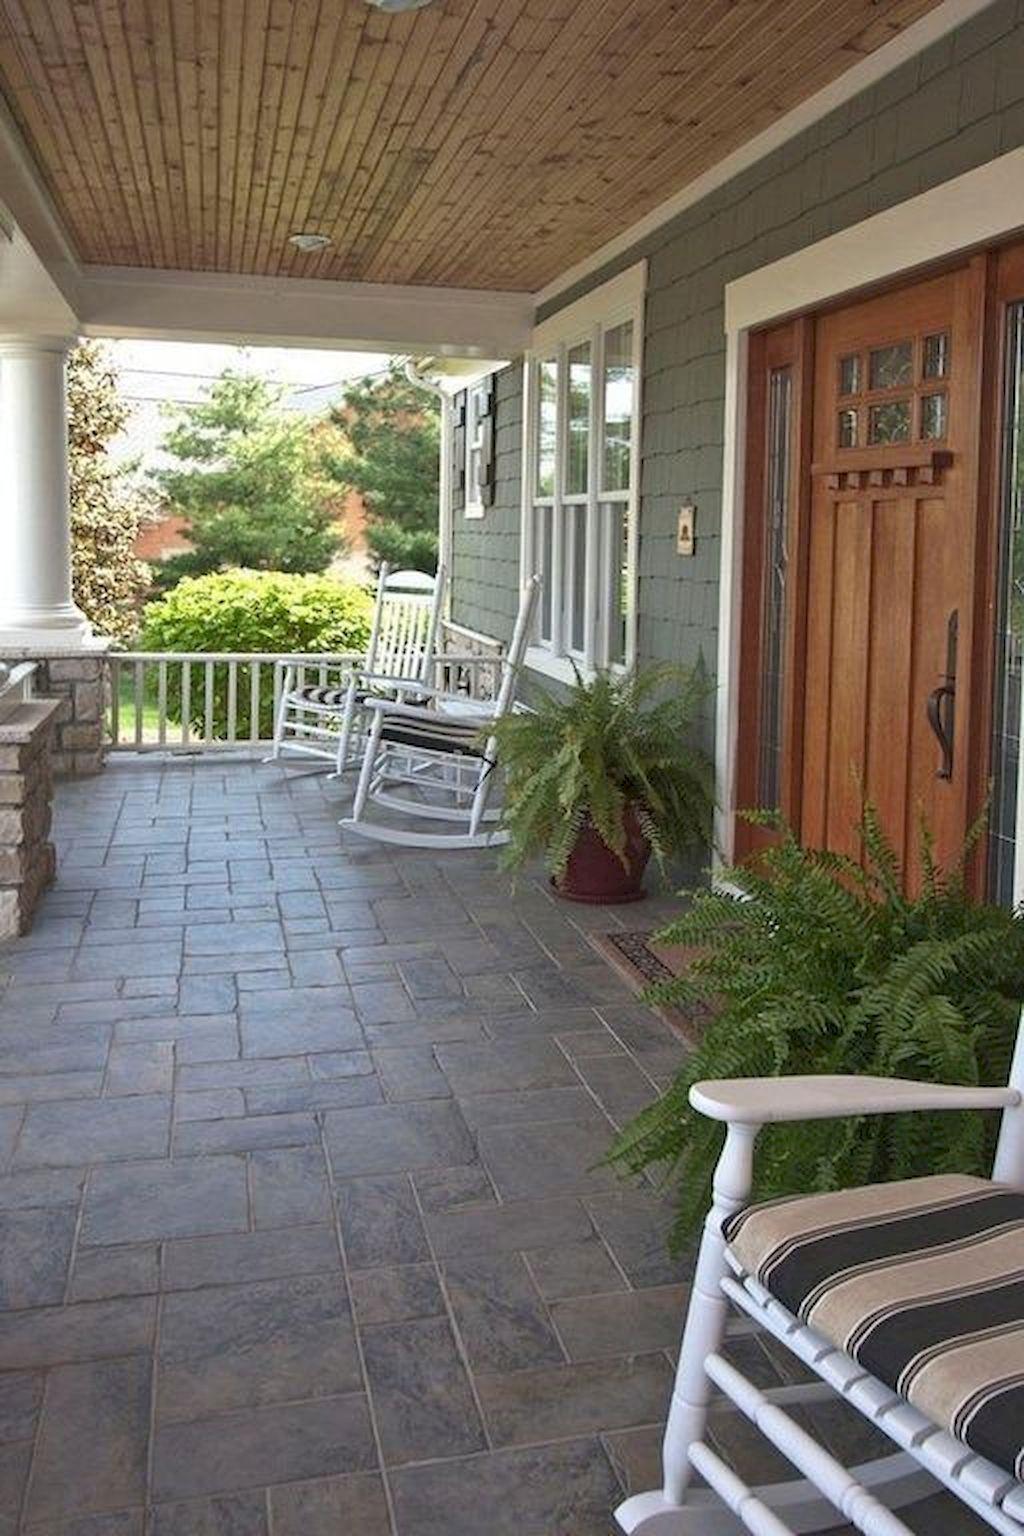 Design Front Porches And House Exterior Design: Awesome 48 Easy Farmhouse Front Porch Decor Design Ideas.